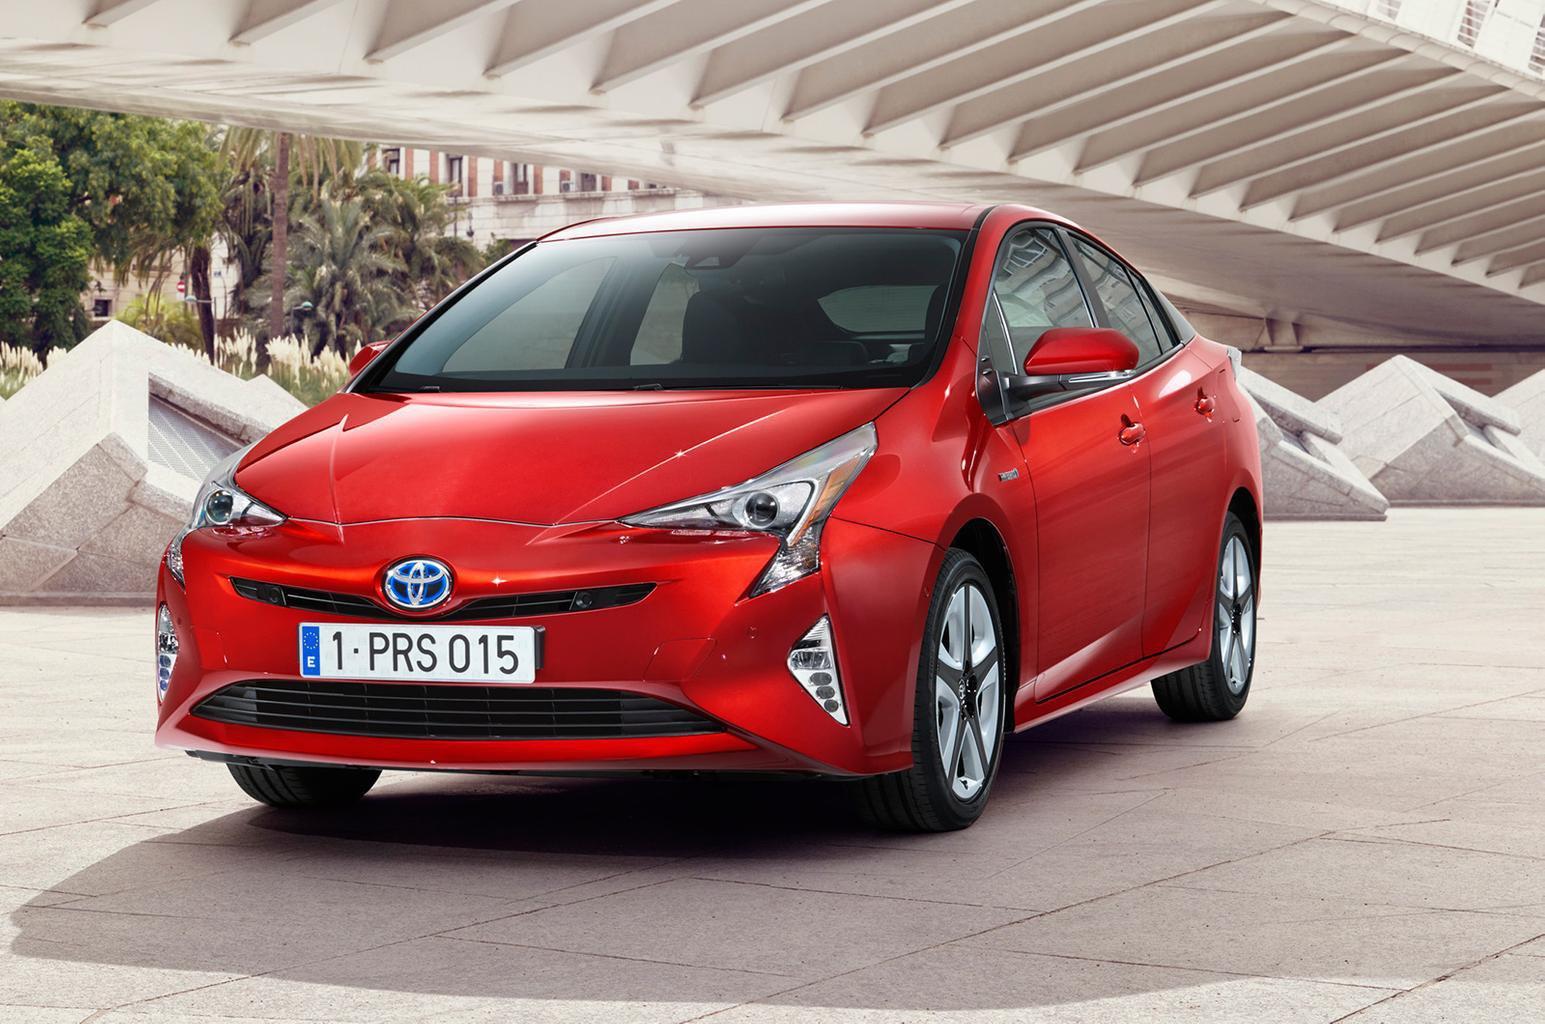 2016 Toyota Prius 18 Fuel Efficiency Gain